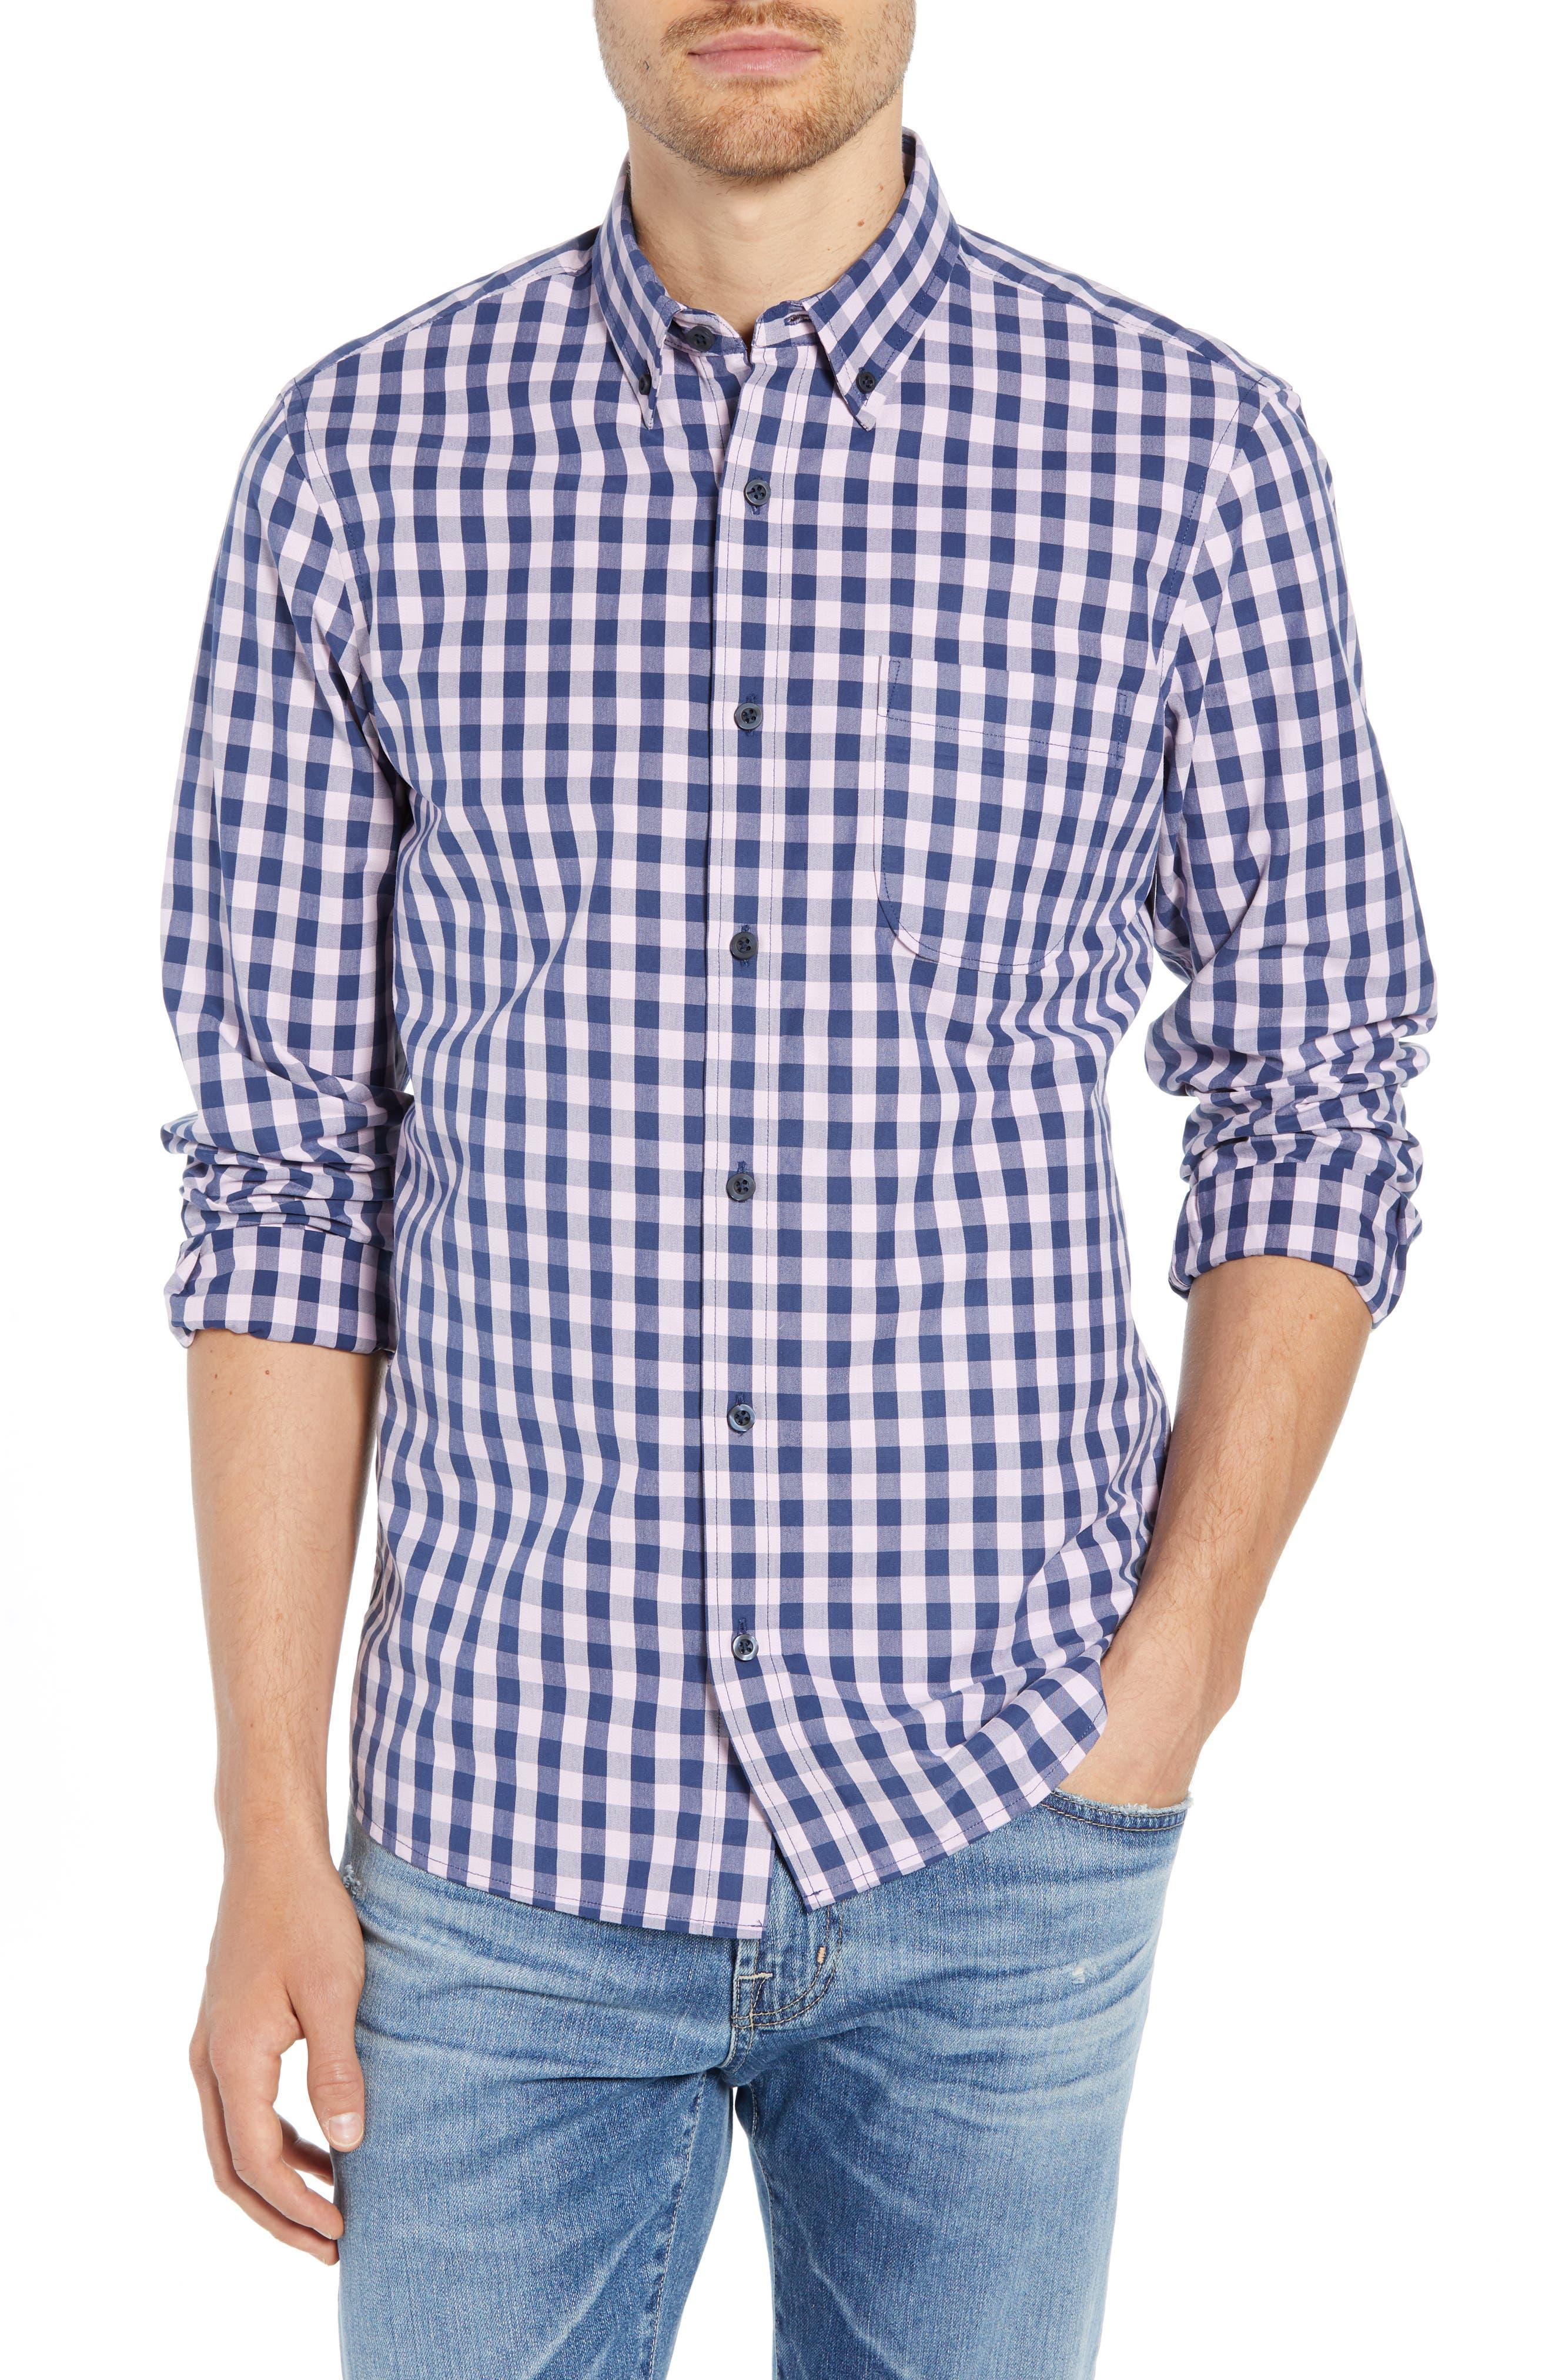 Slim Fit Gingham Sport Shirt,                             Main thumbnail 1, color,                             NAVY IRIS PINK CAMEO GINGHAM